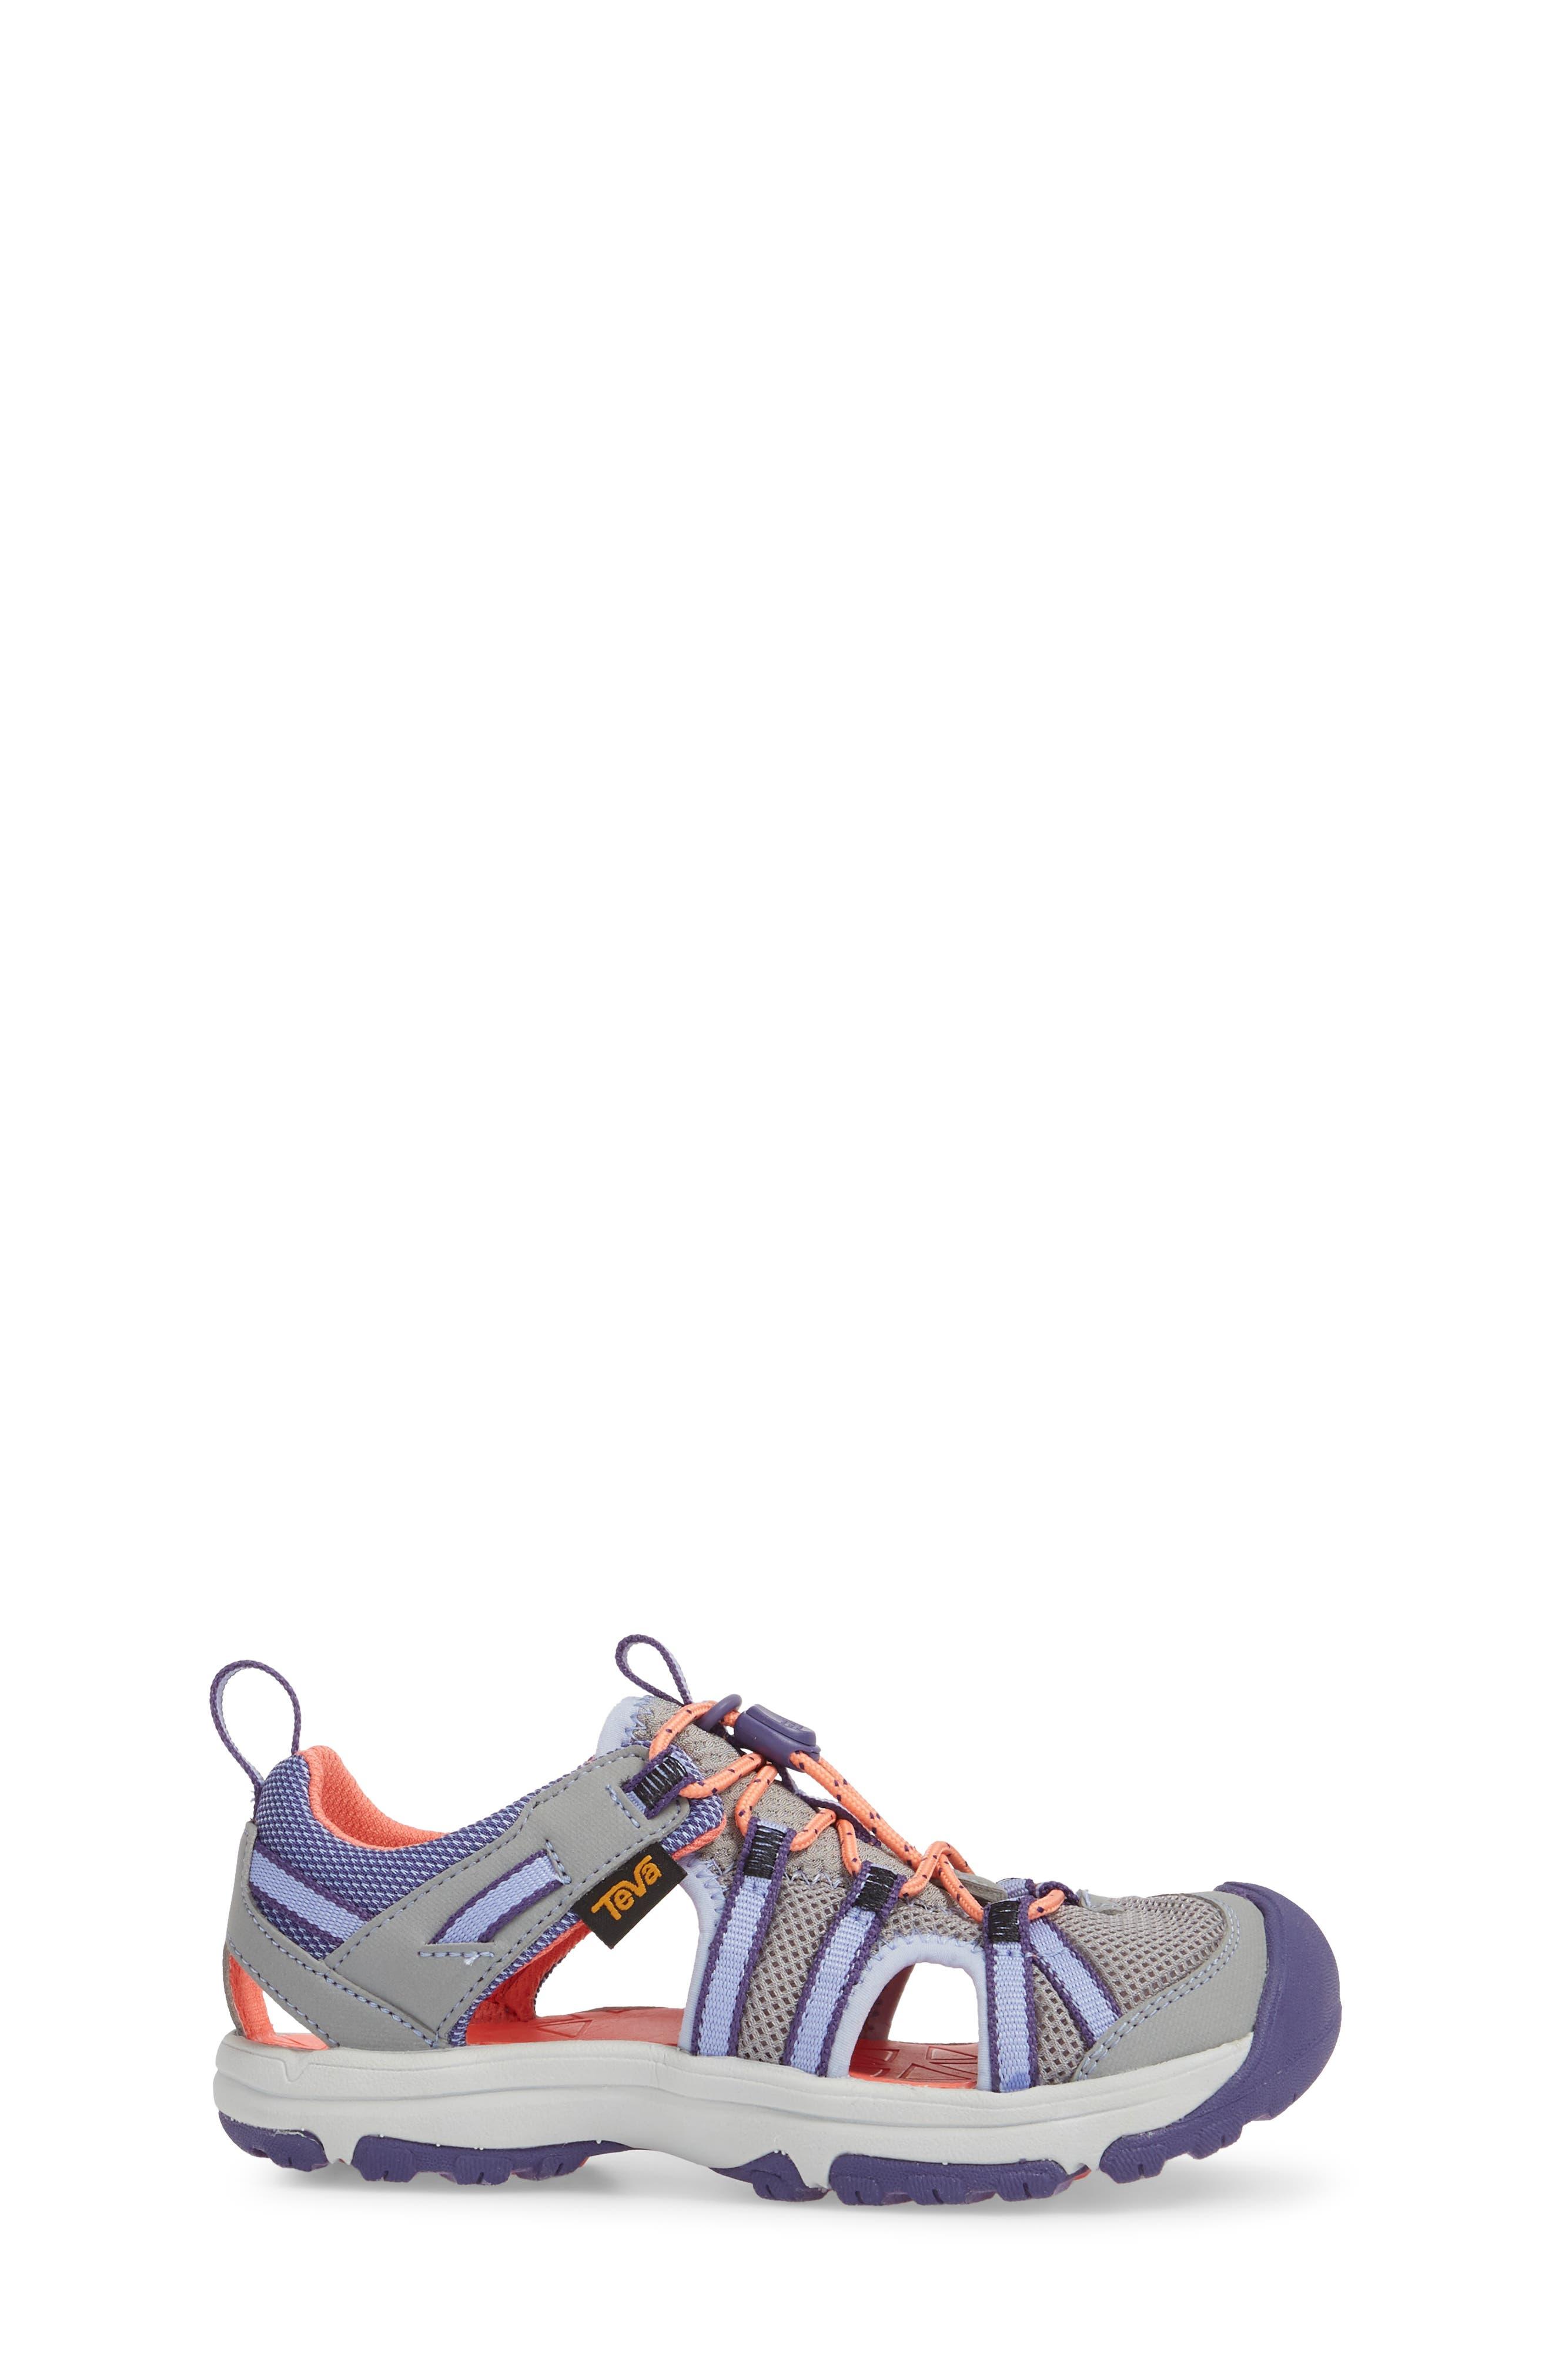 Manatee Sport Sandal,                             Alternate thumbnail 3, color,                             Wild Dove